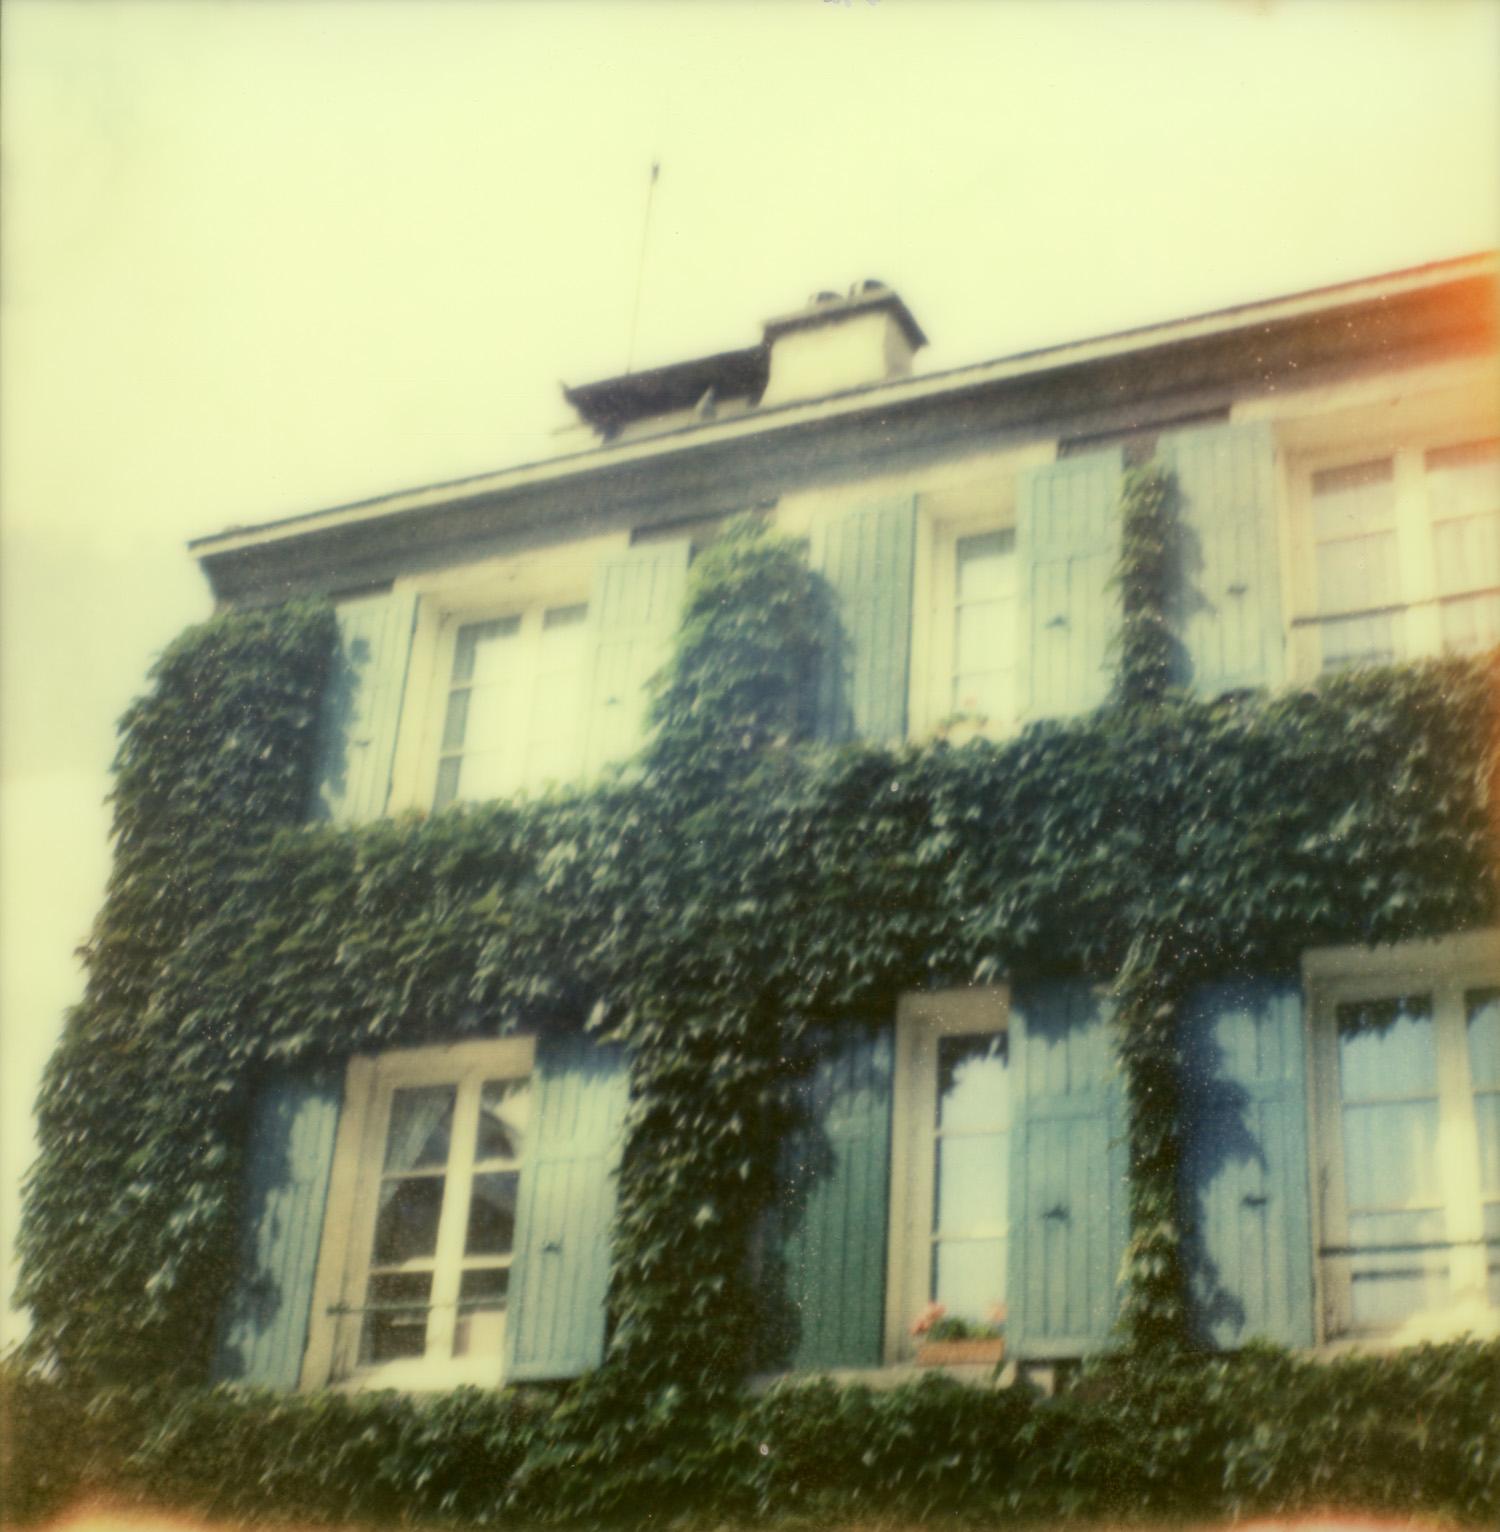 Paris Polaroids by On a hazy morning Amsterdam